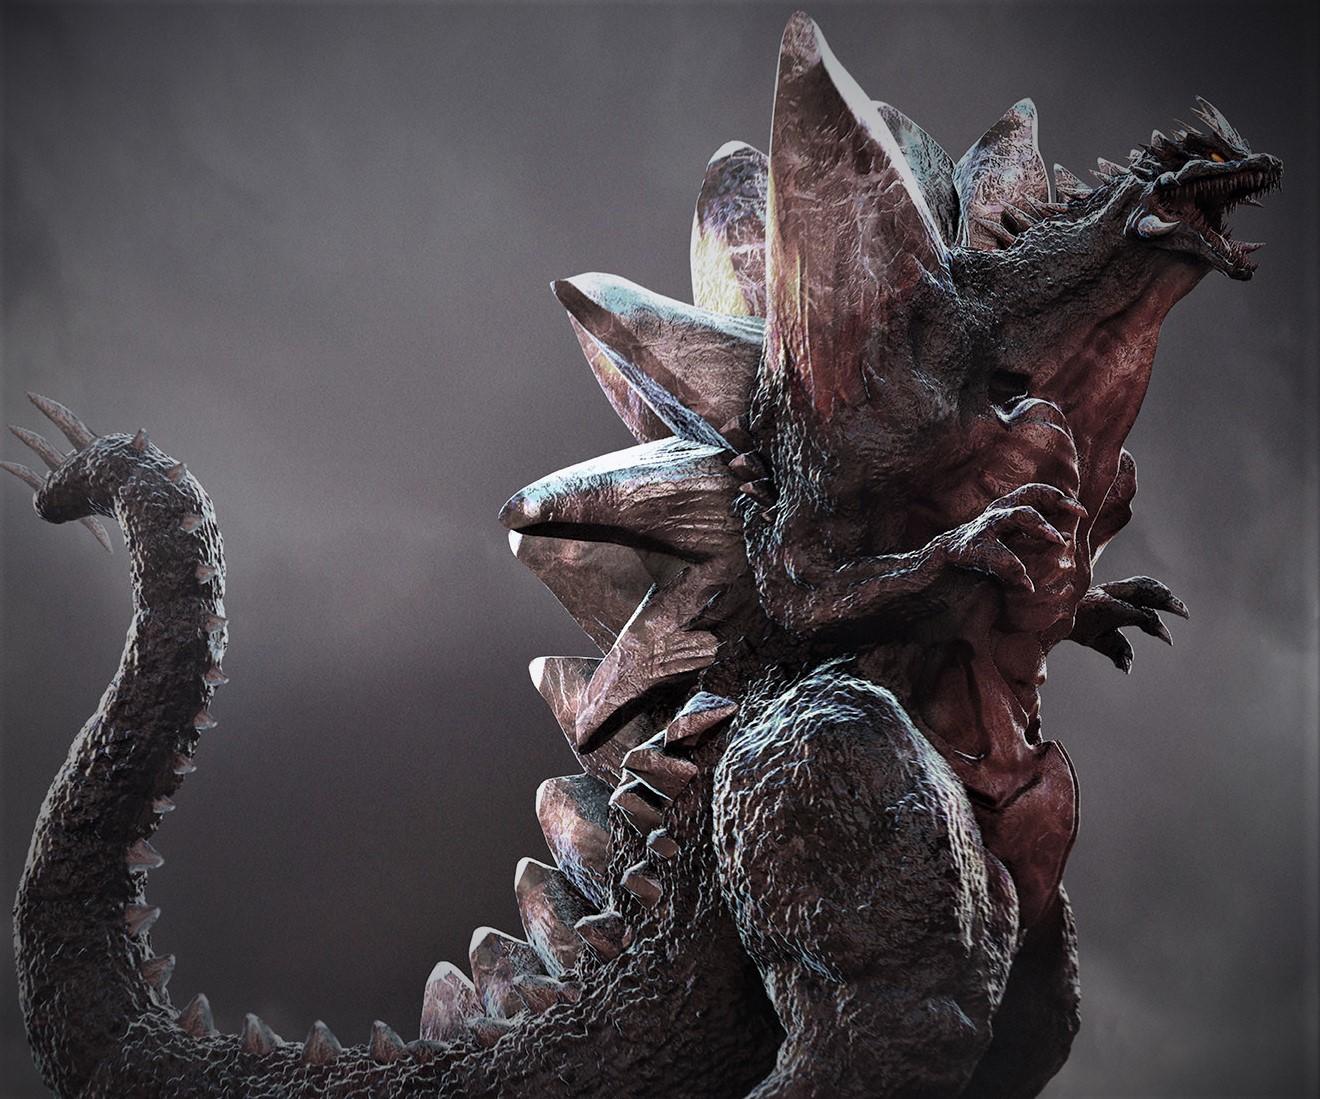 5 Musuh Terkuat Godzilla, Sukses Luar Biasa